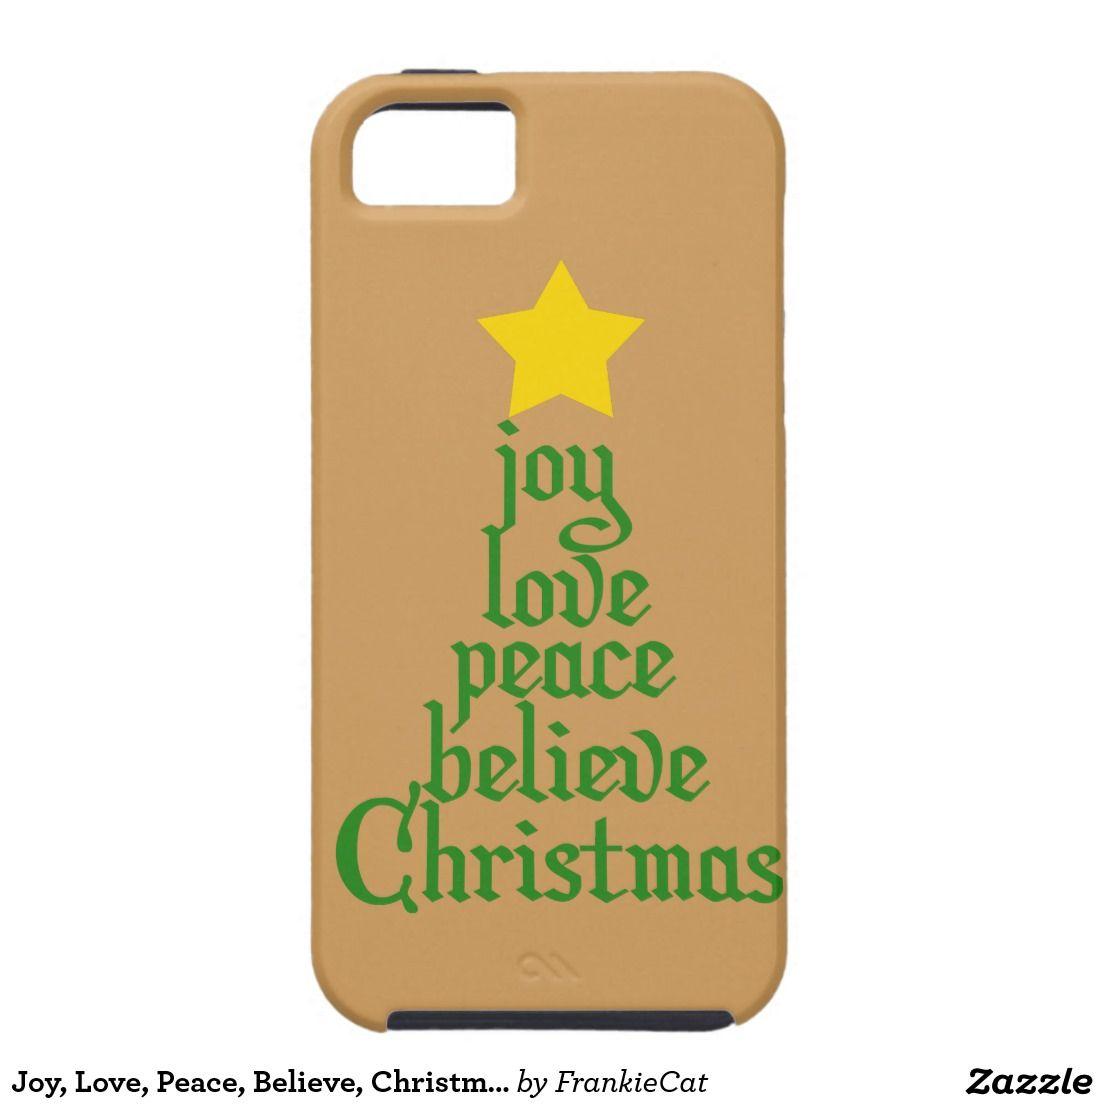 Joy Love Peace Believe Christmas iPhone SEs Case  Iphone se